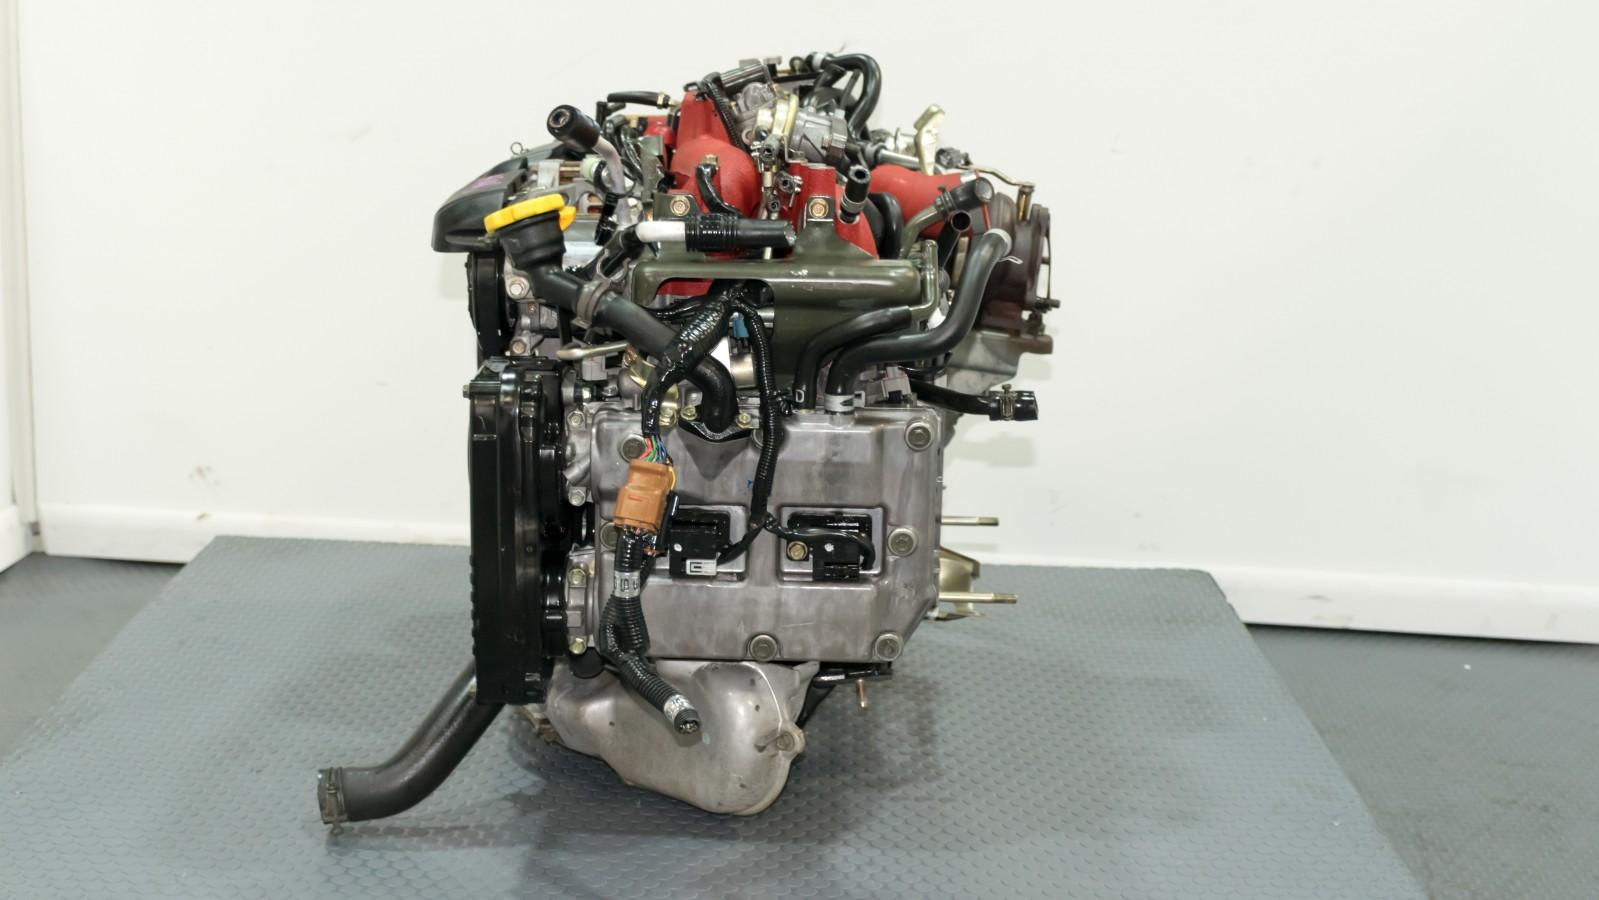 Jdm EJ207 Engine Version 7 EJ22 2 2L Stroker by Tommy Kaira built TMIC Ecu  Downpipe AVCS Harness